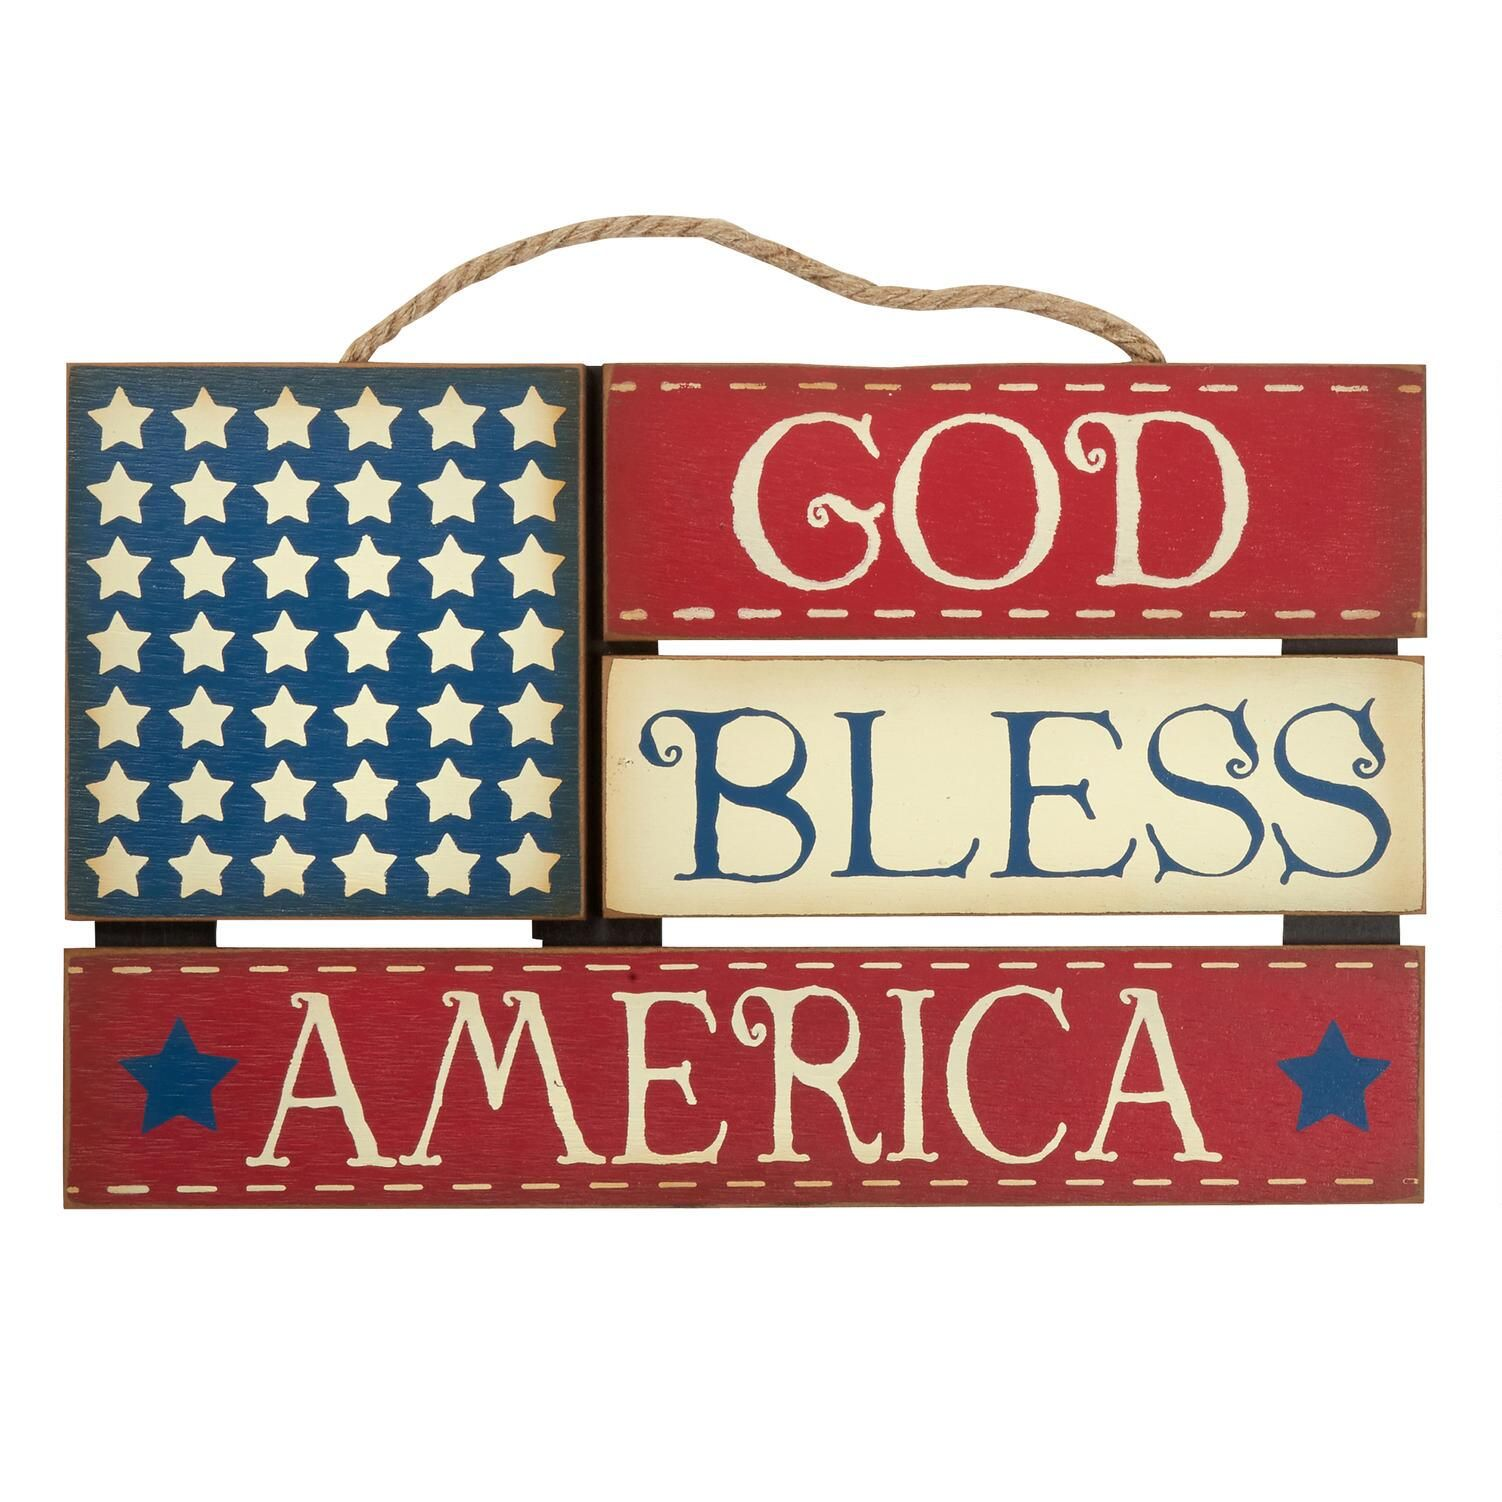 15 5 God Bless American Flag Wood Wall Hanger God Bless Wall American Flag Wood Christmas Tree Shop Fourth Of July Decor